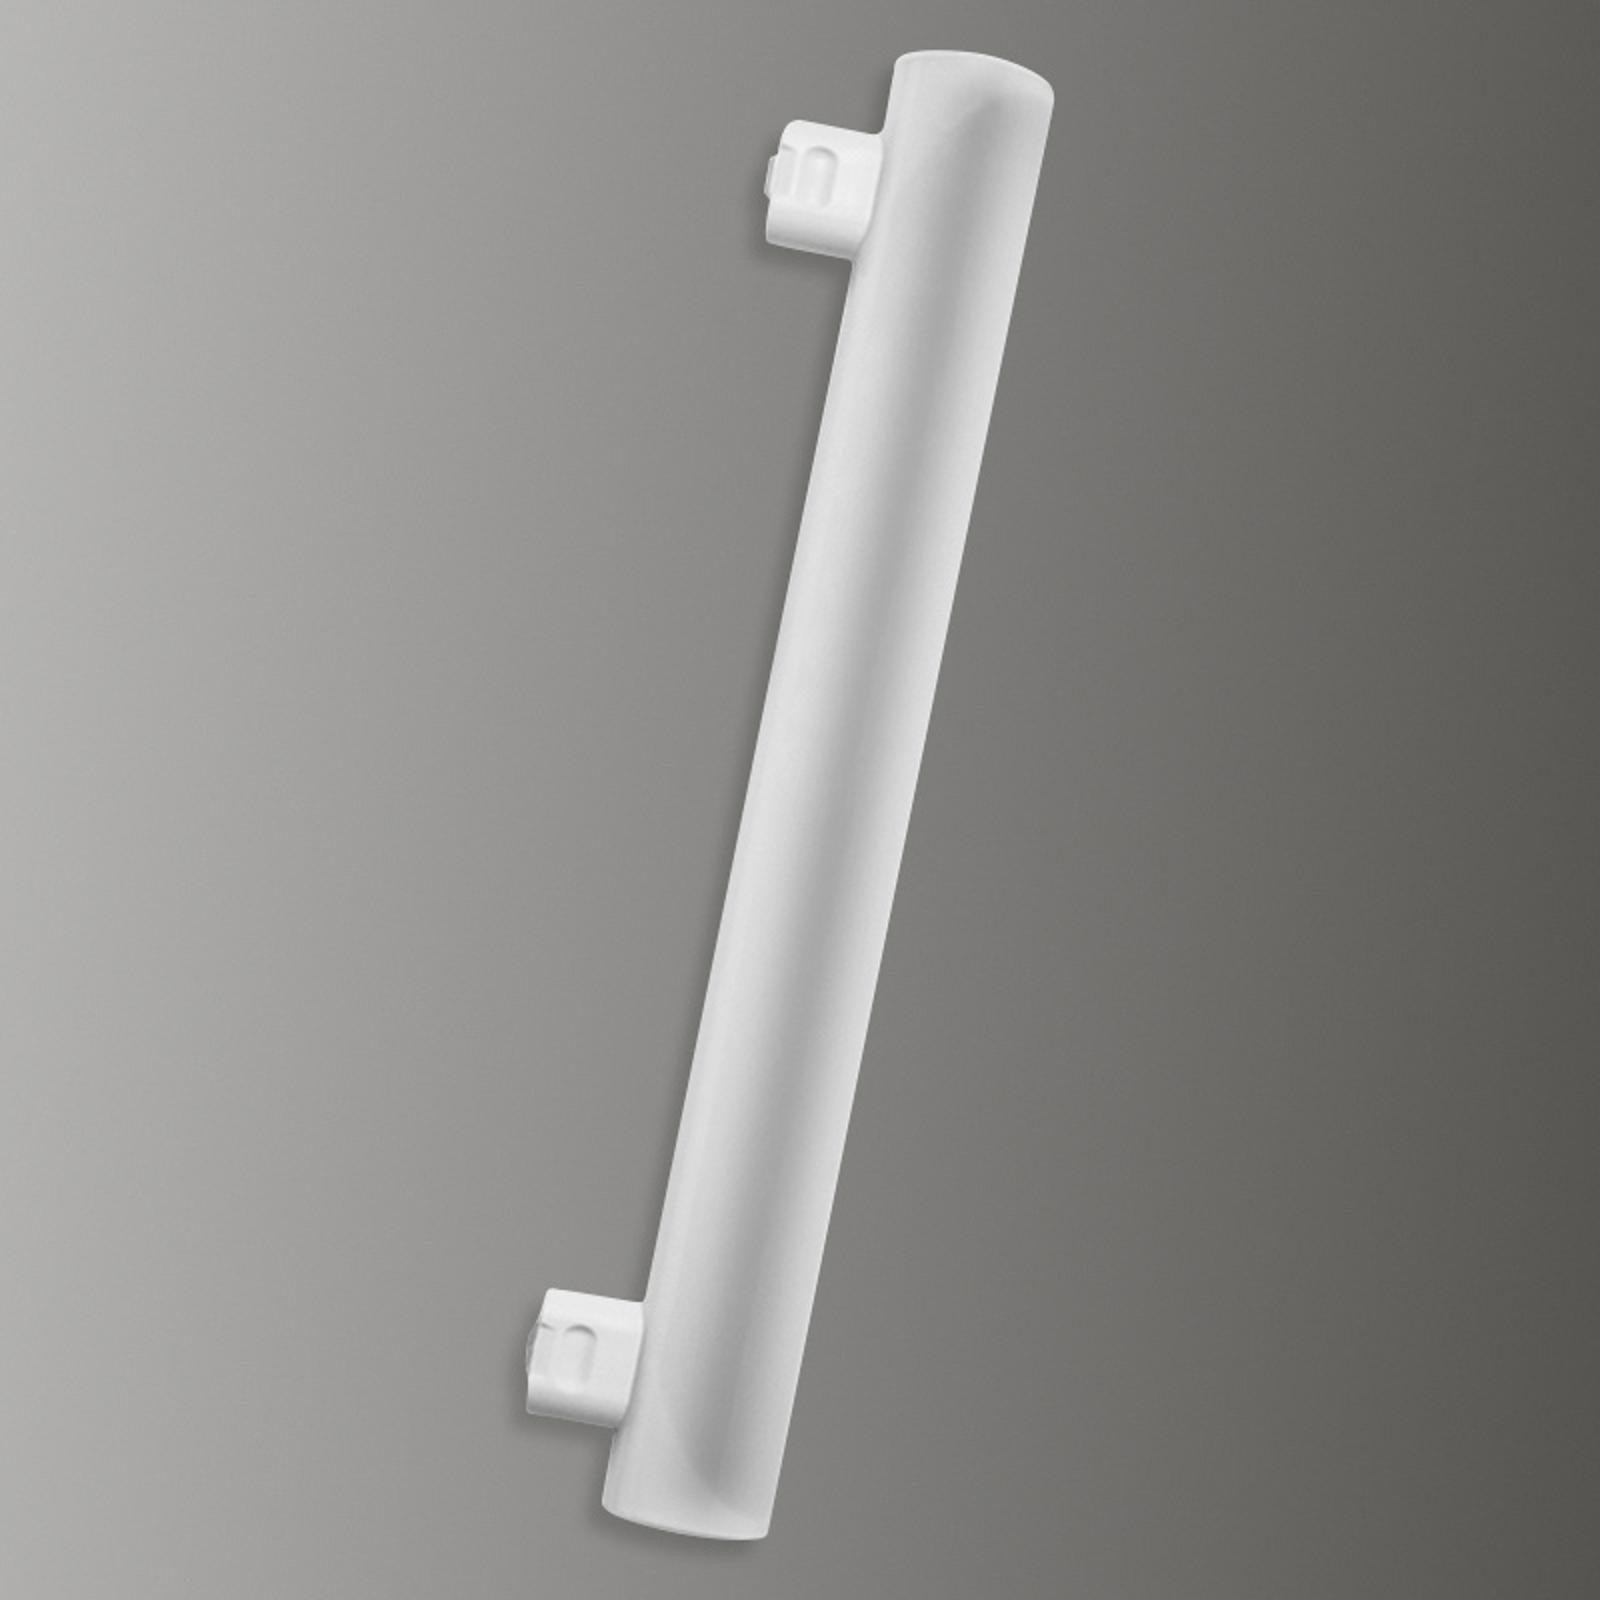 S14s 4W 827 LED-putkilamppu, 2-kantainen, 300 mm